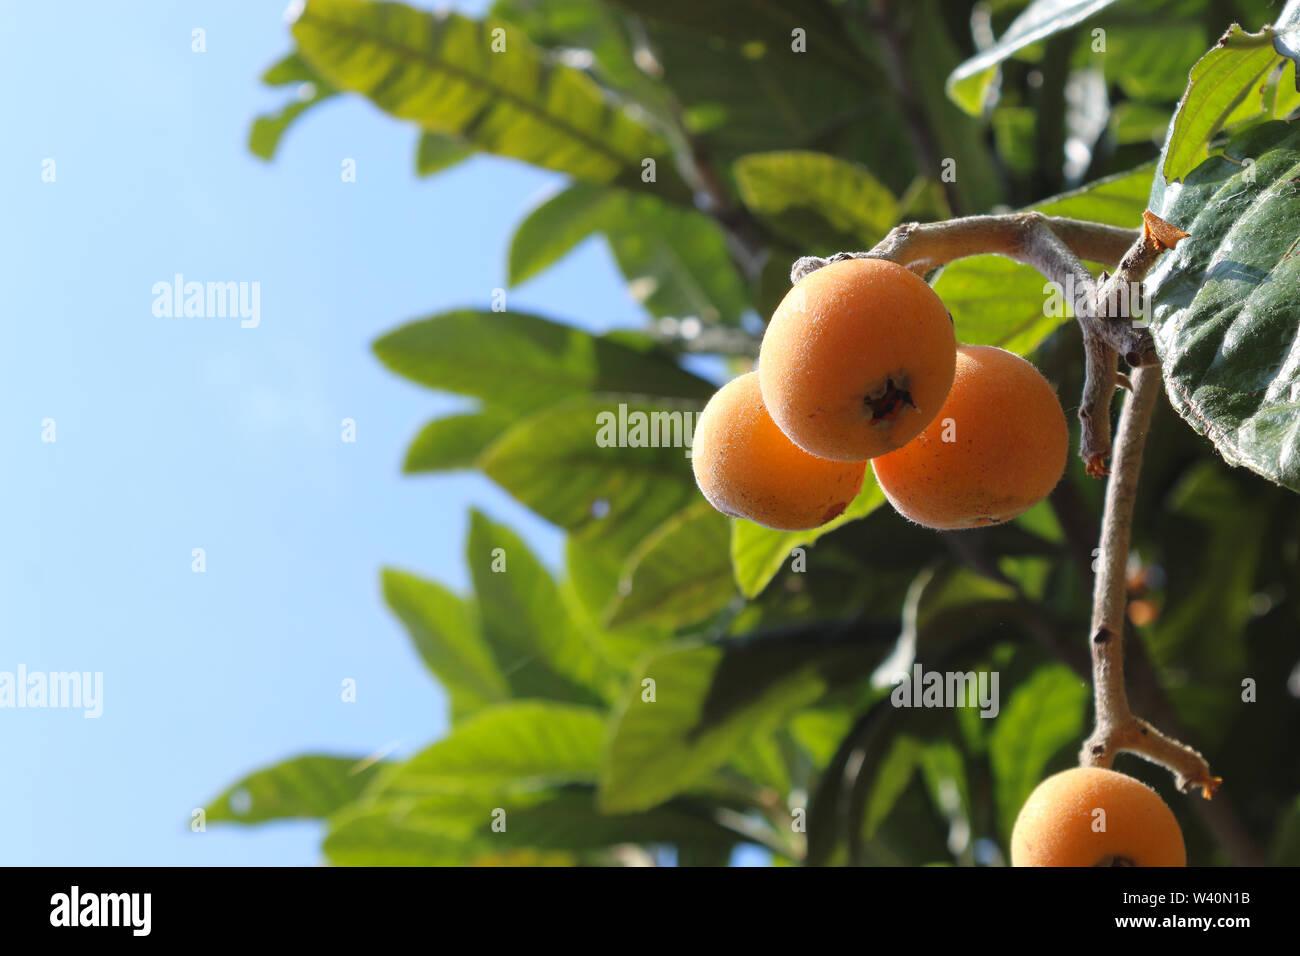 Ripe medlars on tree, healthy fresh summer fruit - Stock Image